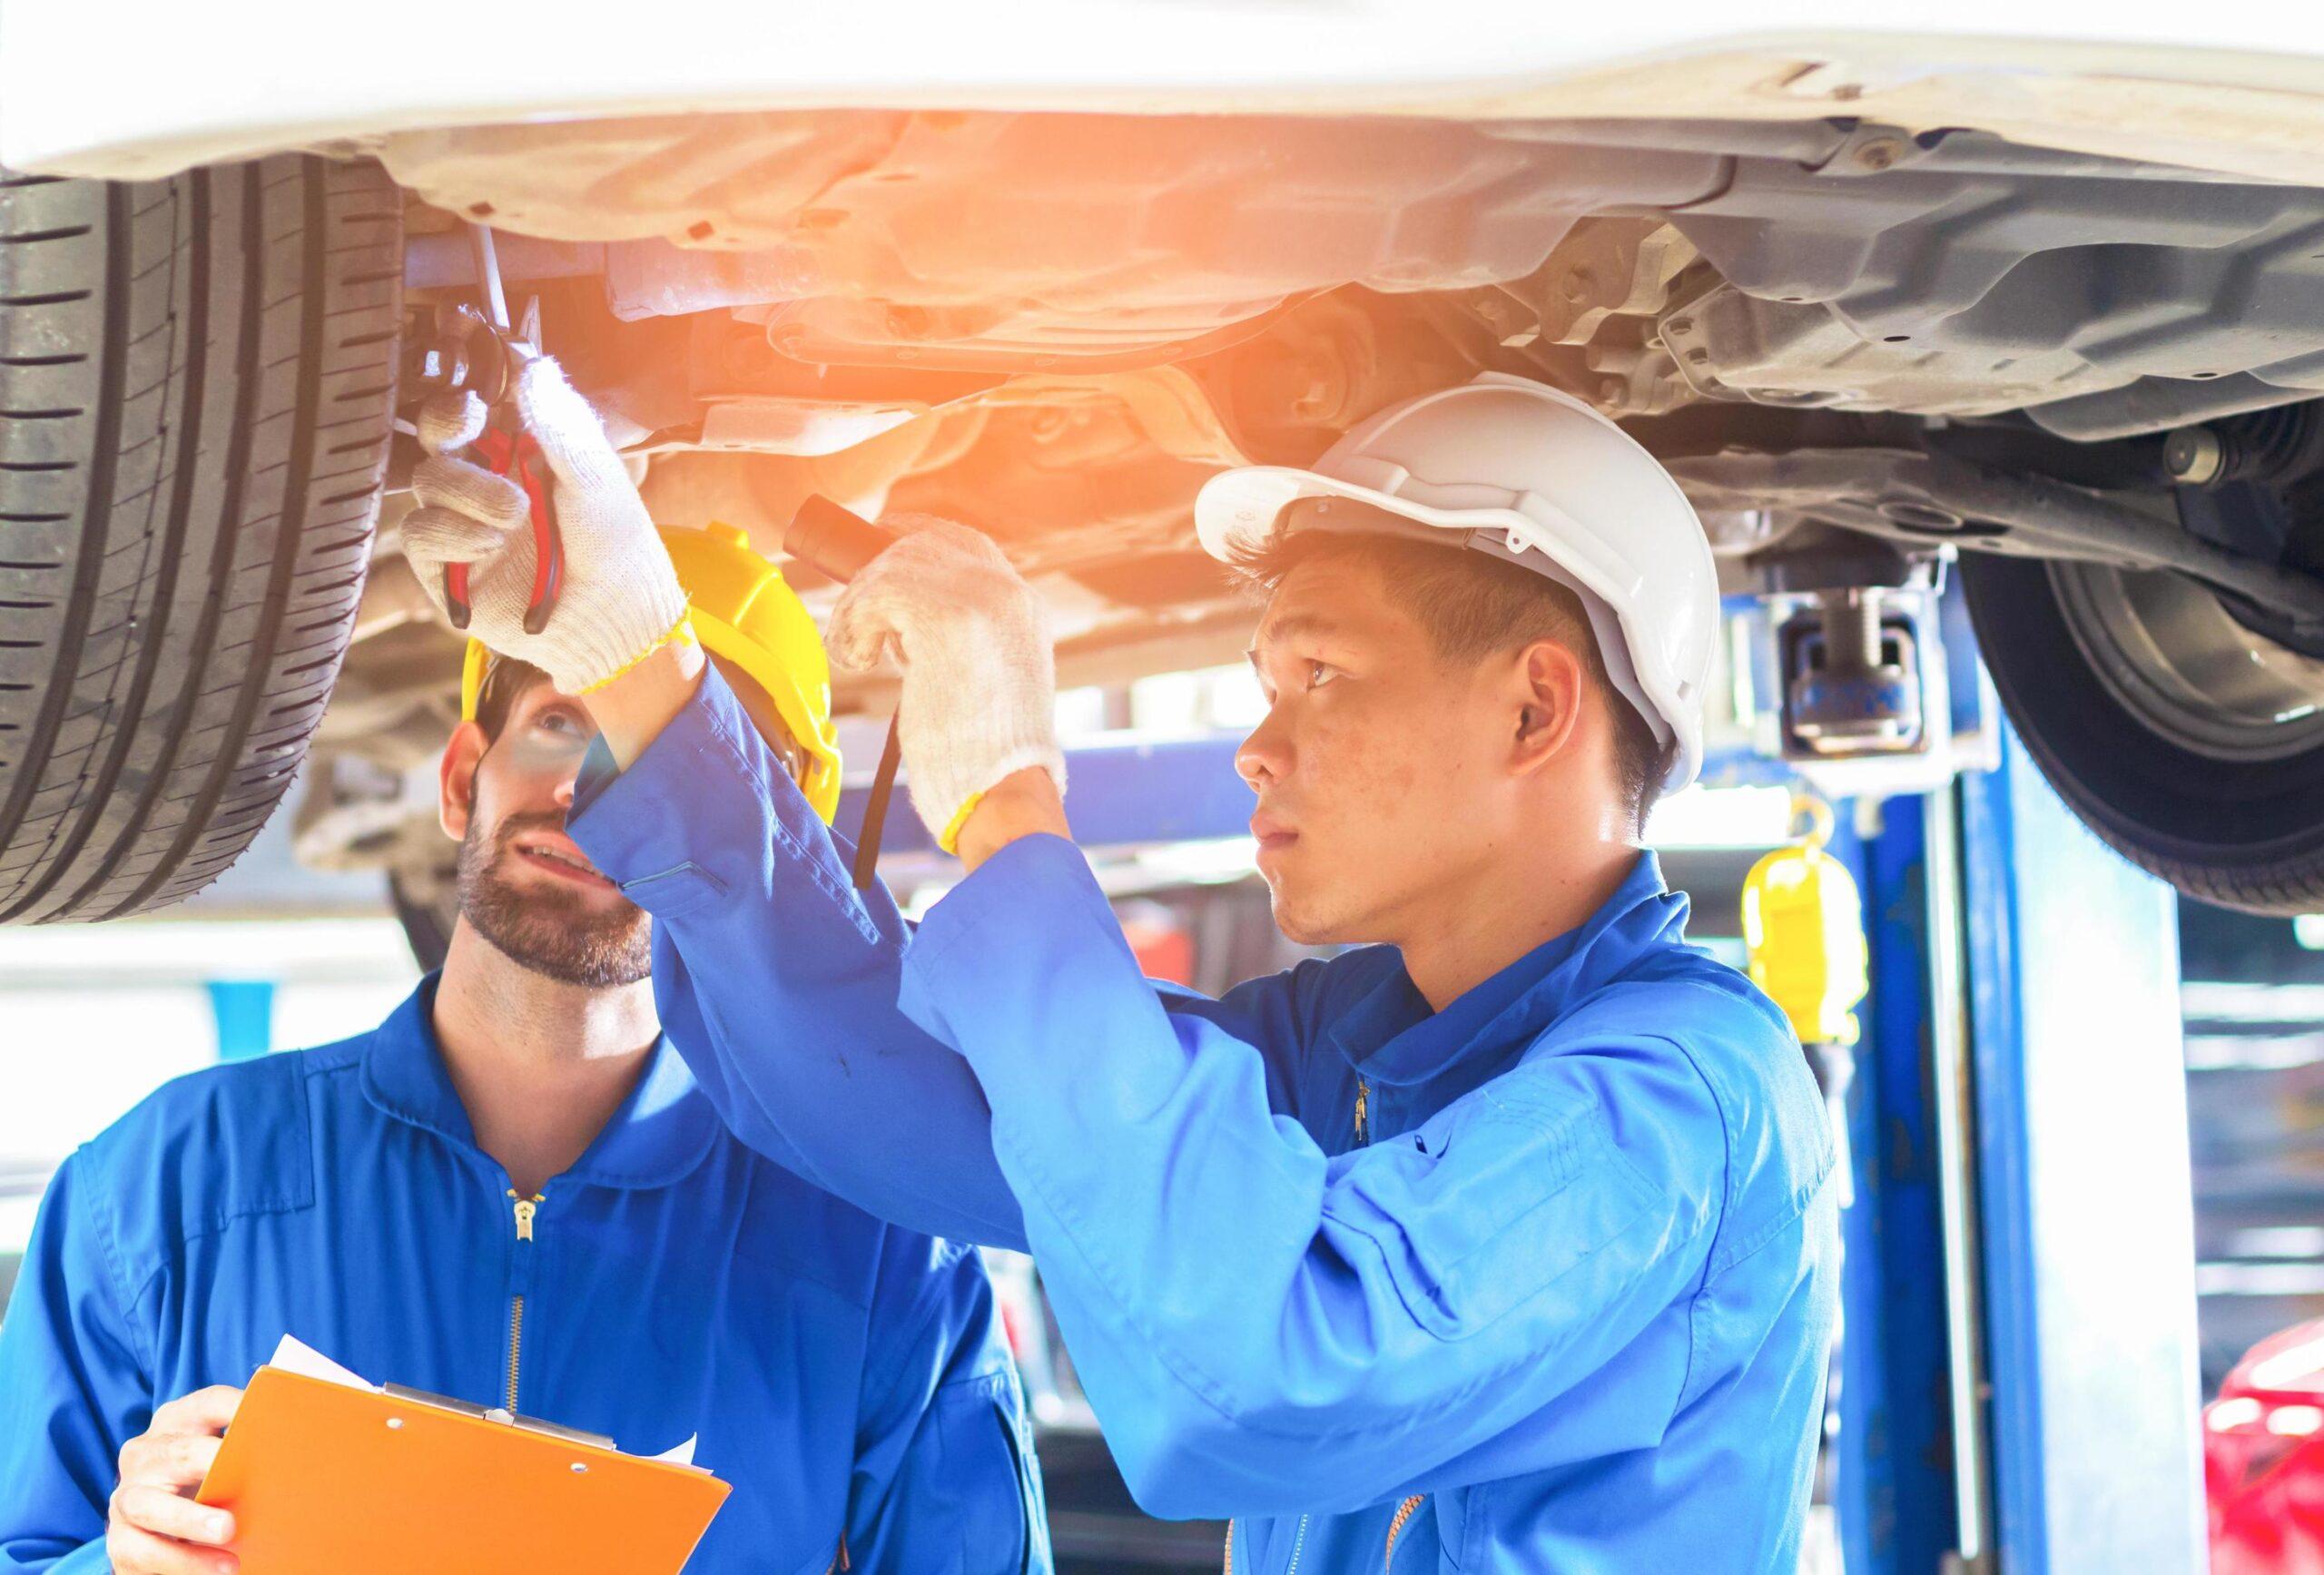 Profitable auto repair business in Kansas